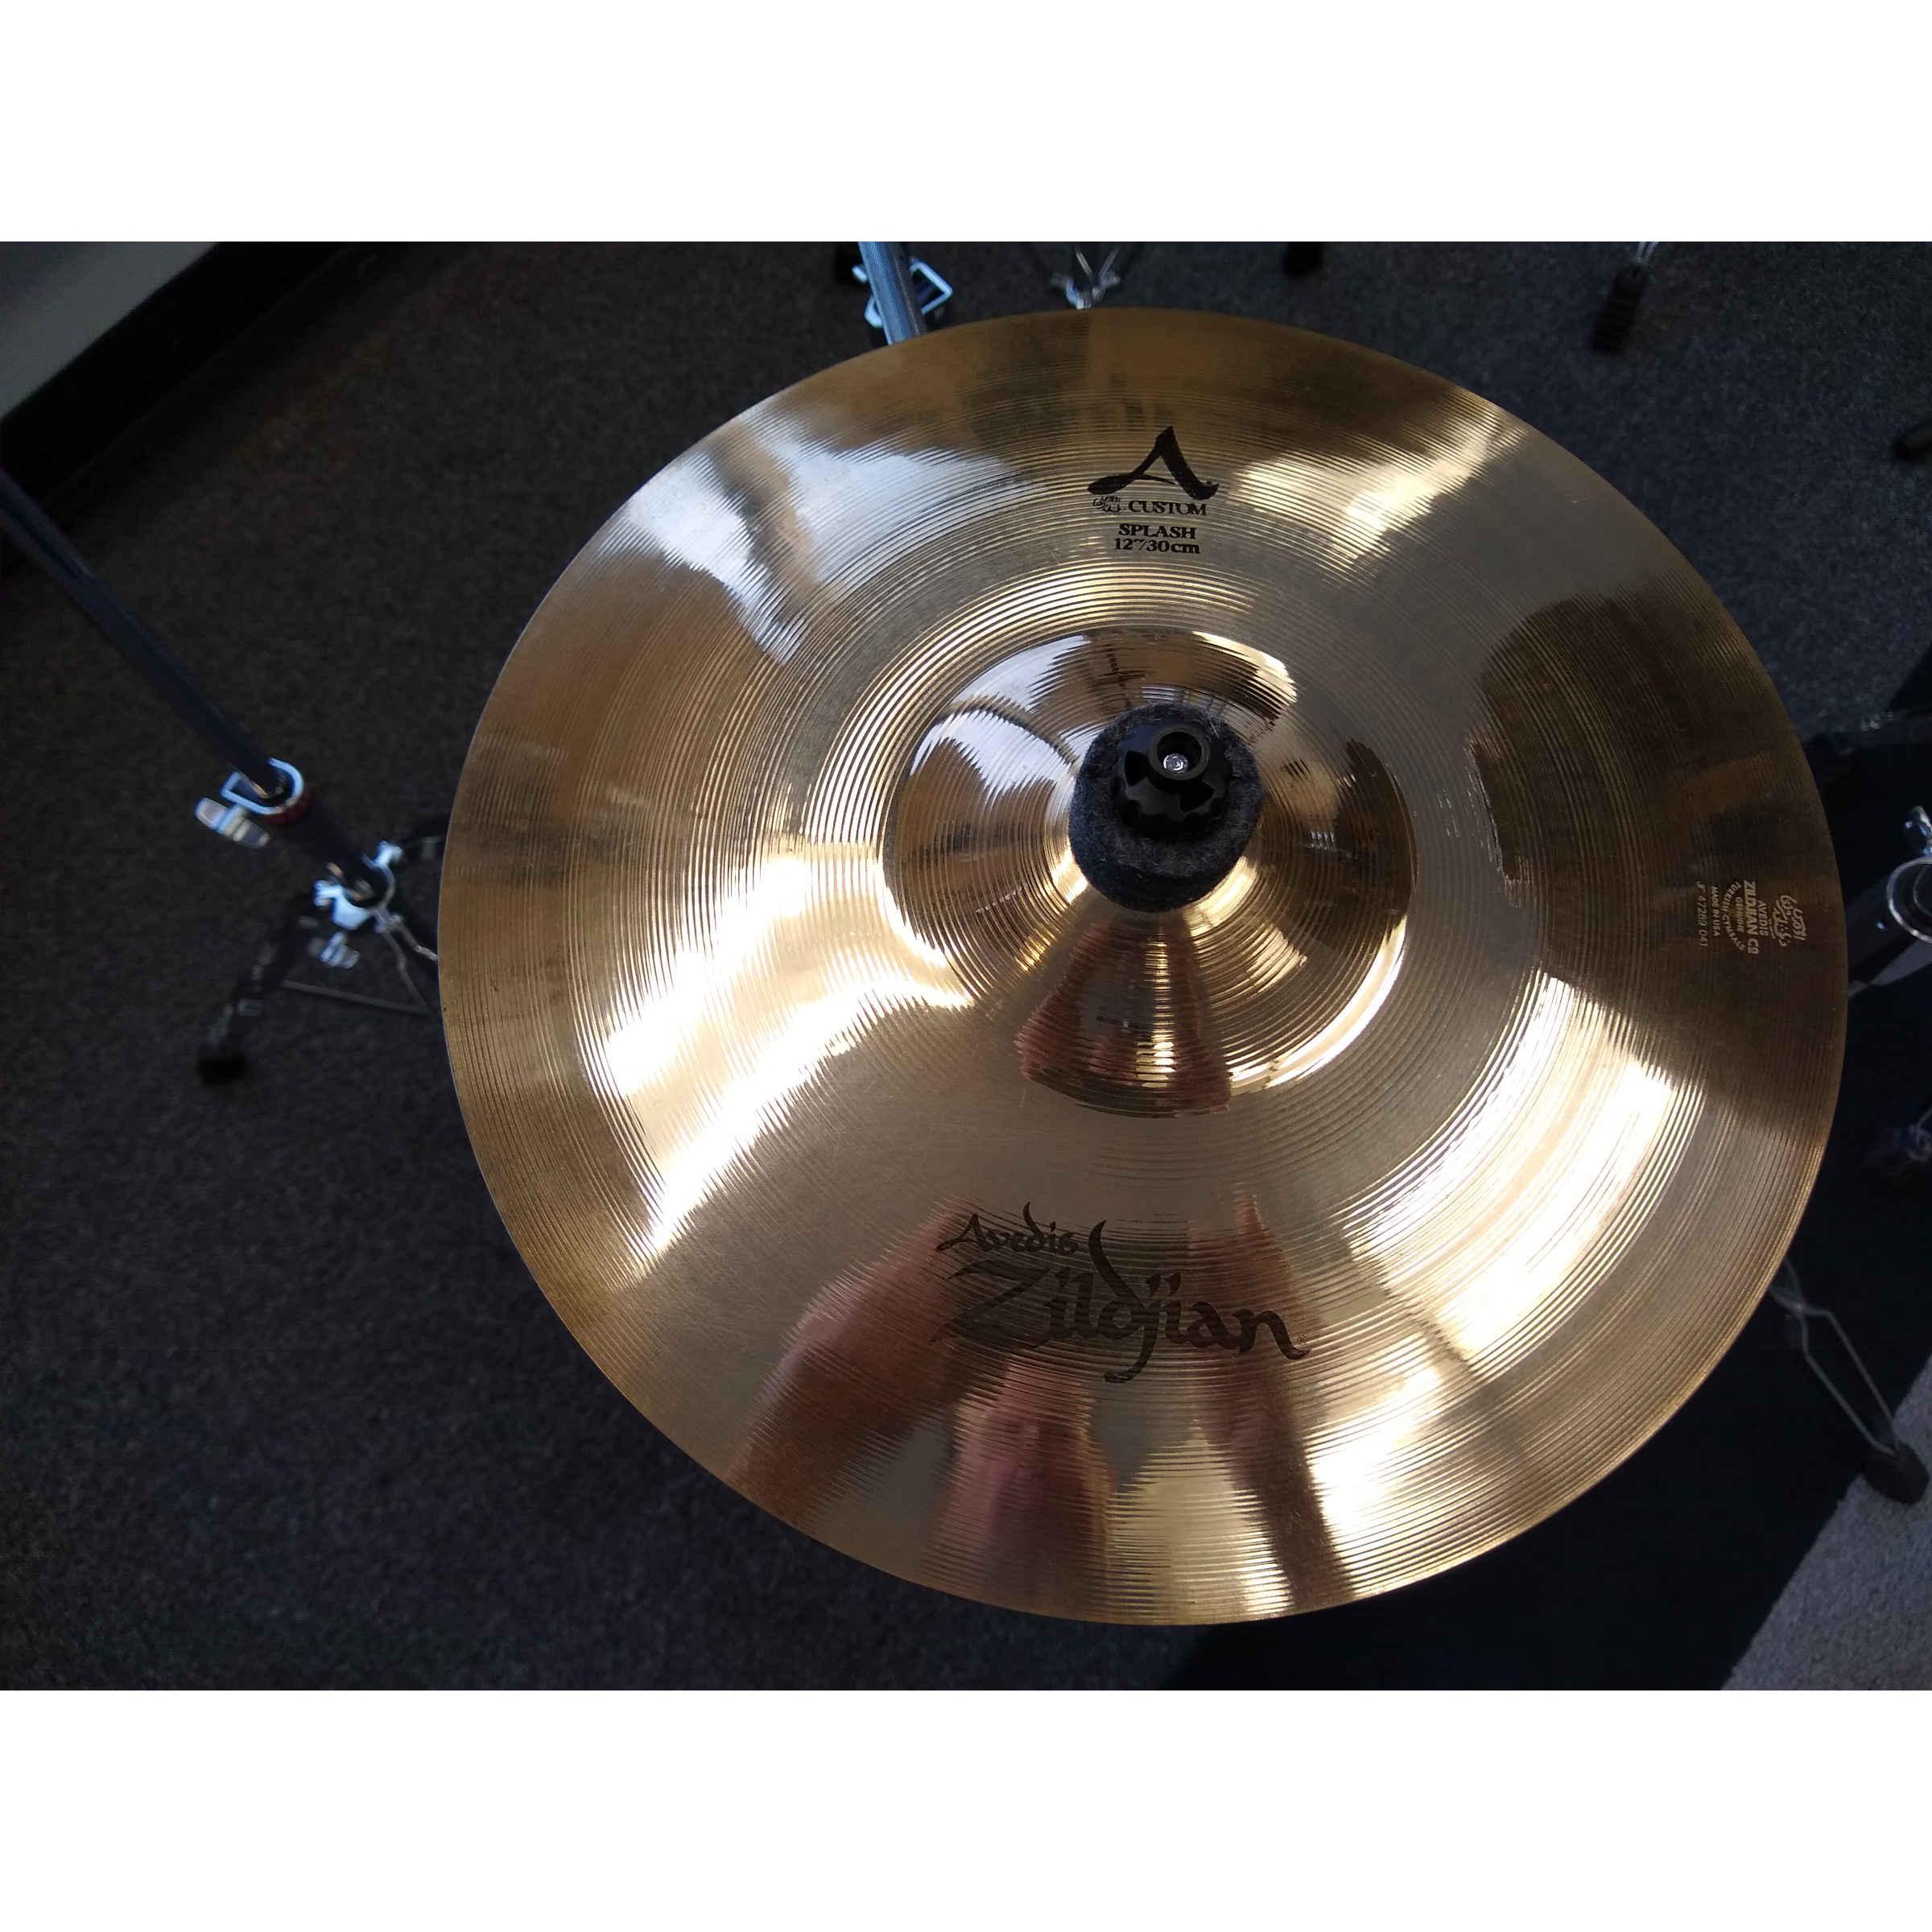 Zildjian Avedis Custom 14